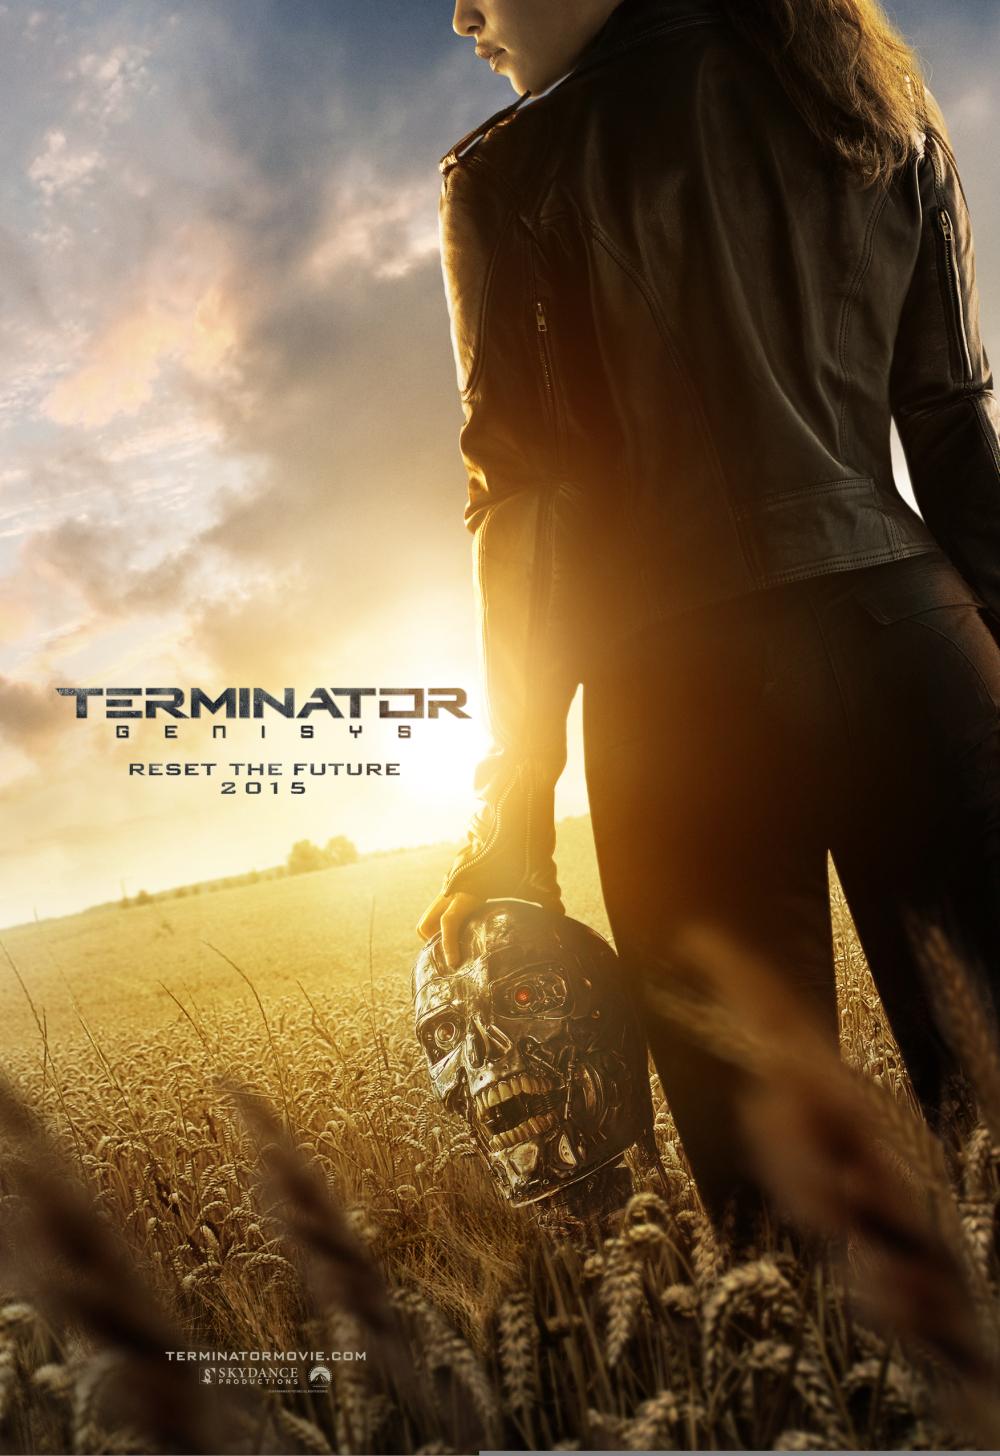 Terminator: Genisys / Arnold Schwarzenegger Roles